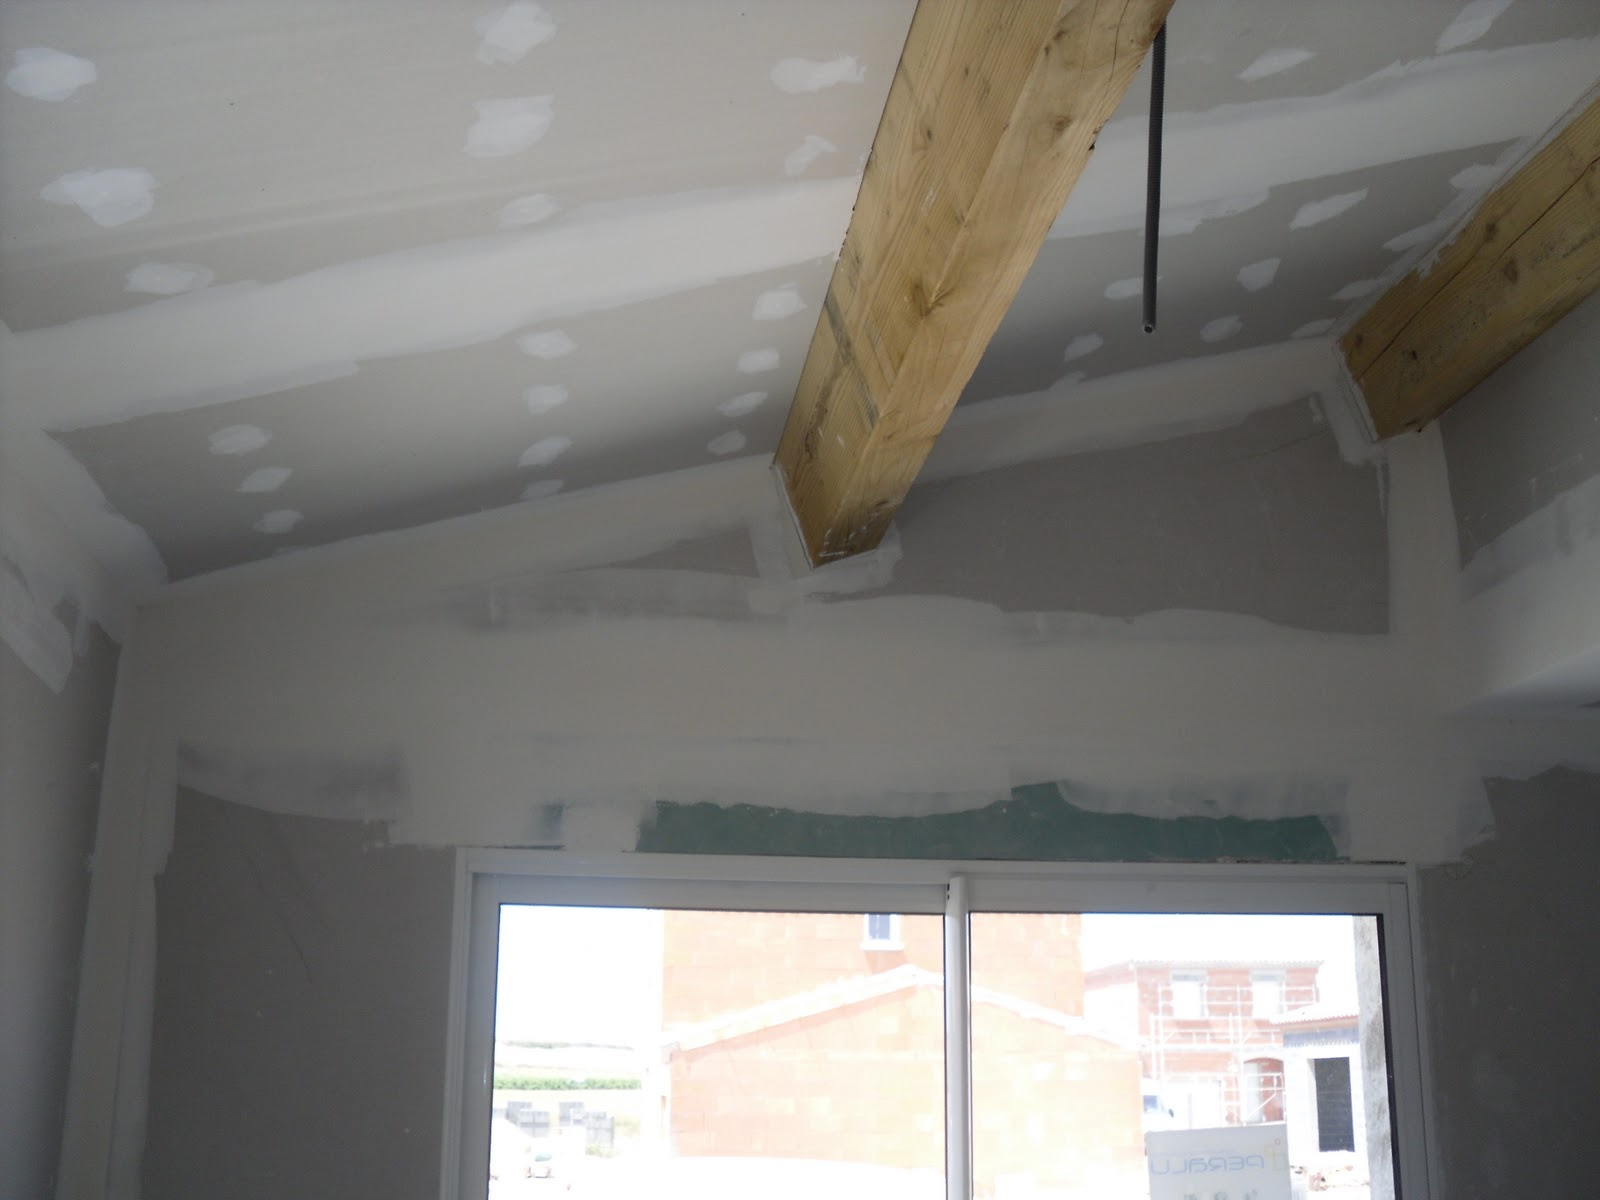 renover un plafond en placo lacharlott with renover un plafond en placo good renover un. Black Bedroom Furniture Sets. Home Design Ideas